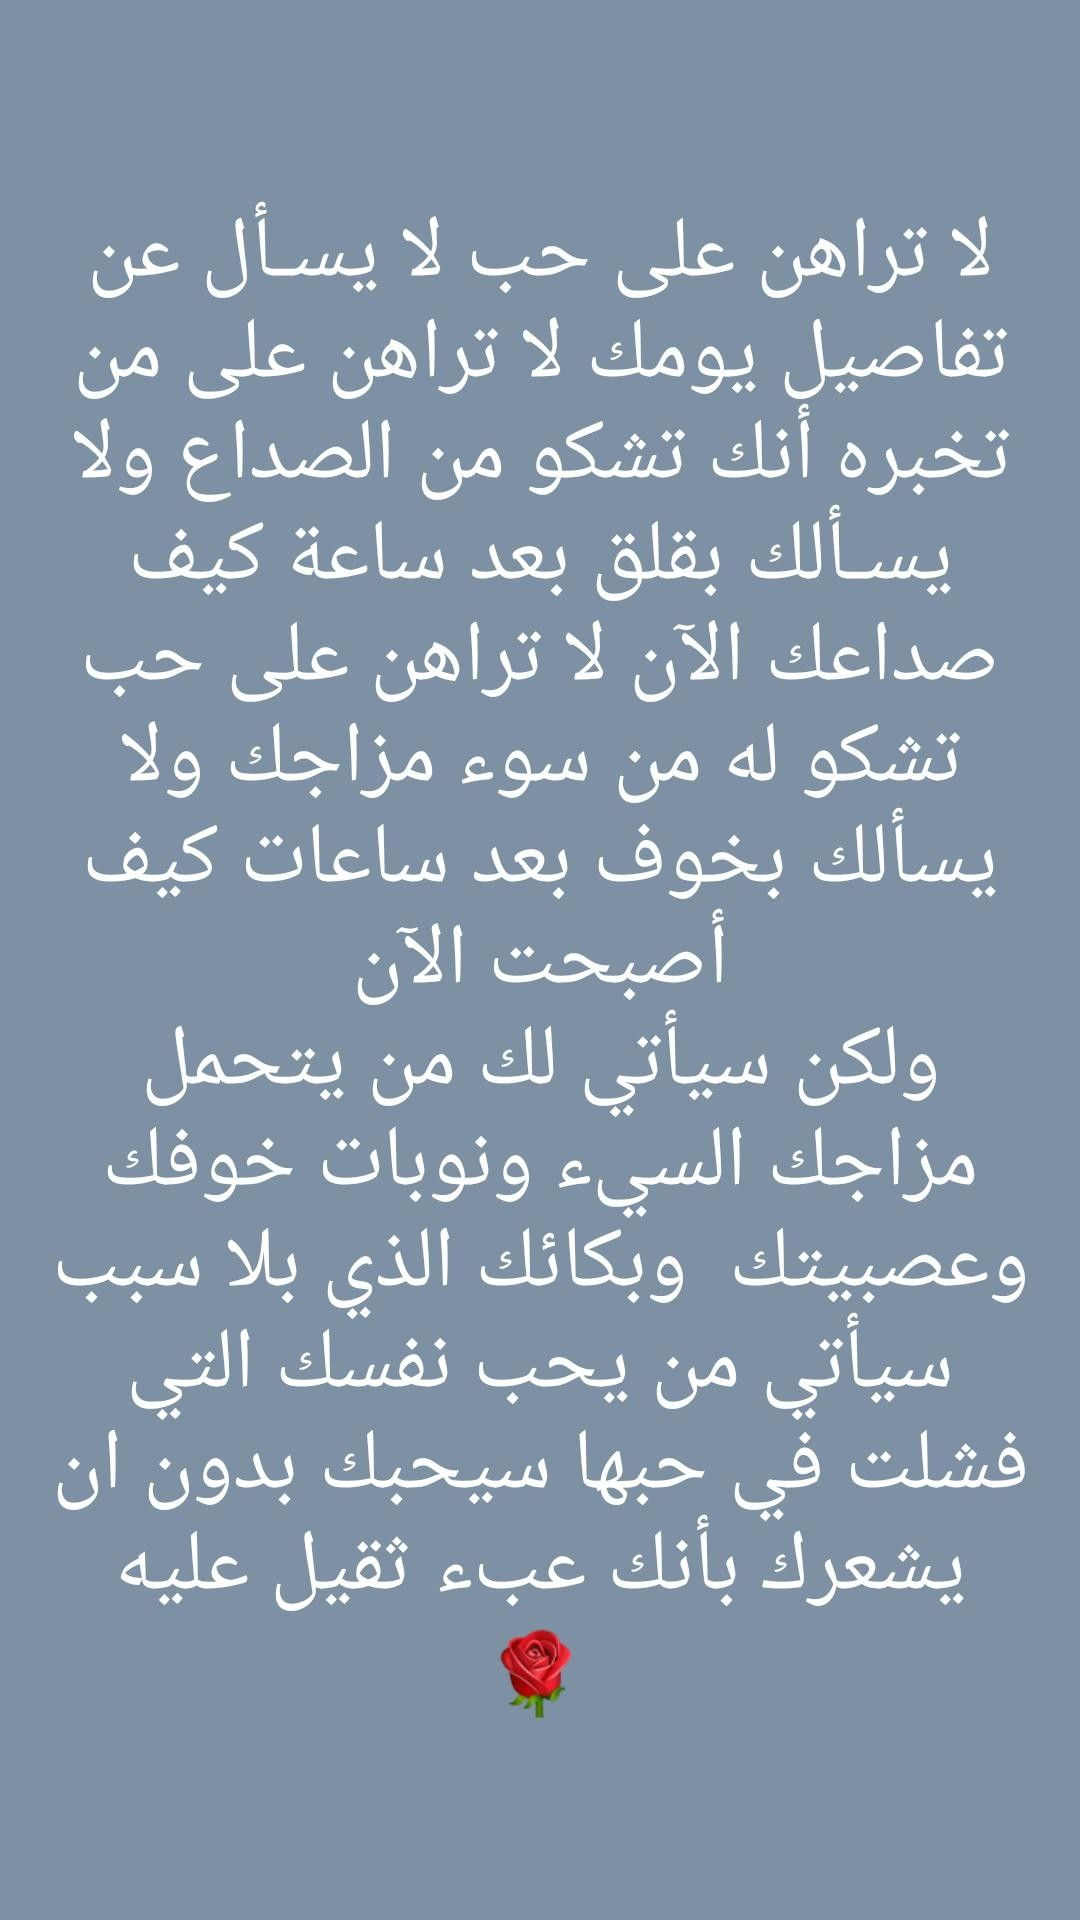 Pin By Lyan Hitham On خواطر Calligraphy Arabic Calligraphy Arabic